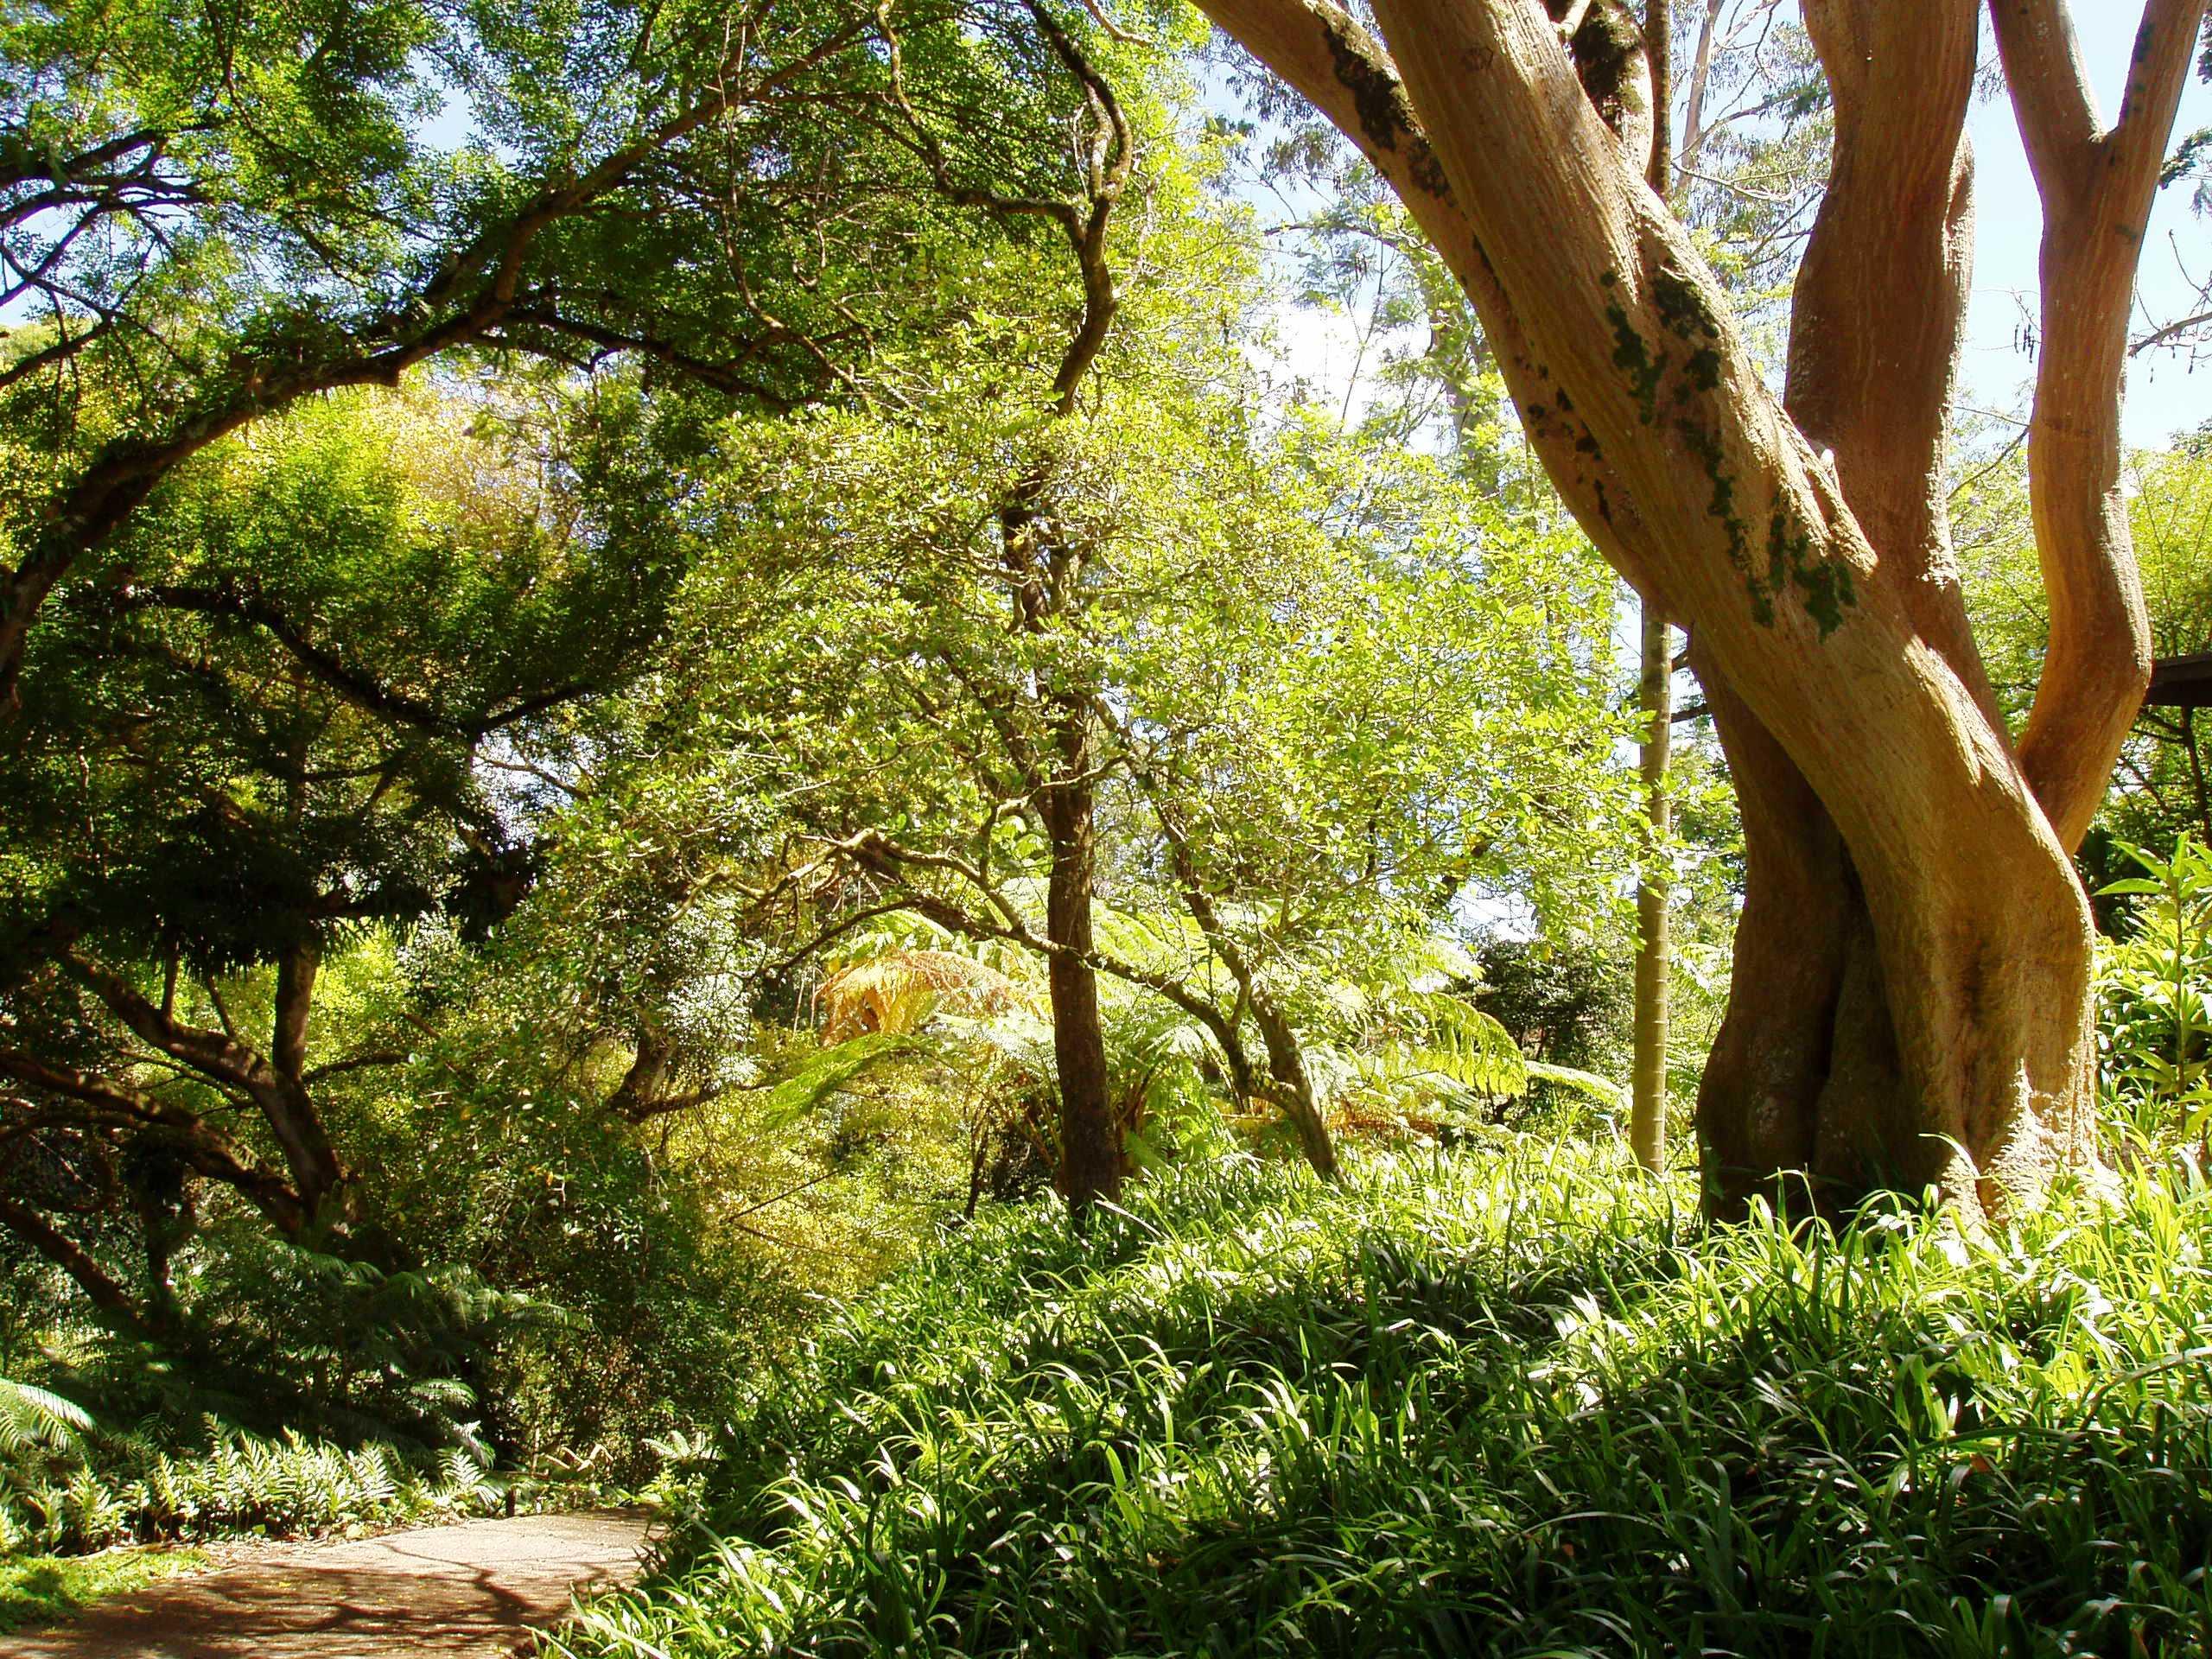 File:Wahiawa Botanical Garden - shady park view JPG